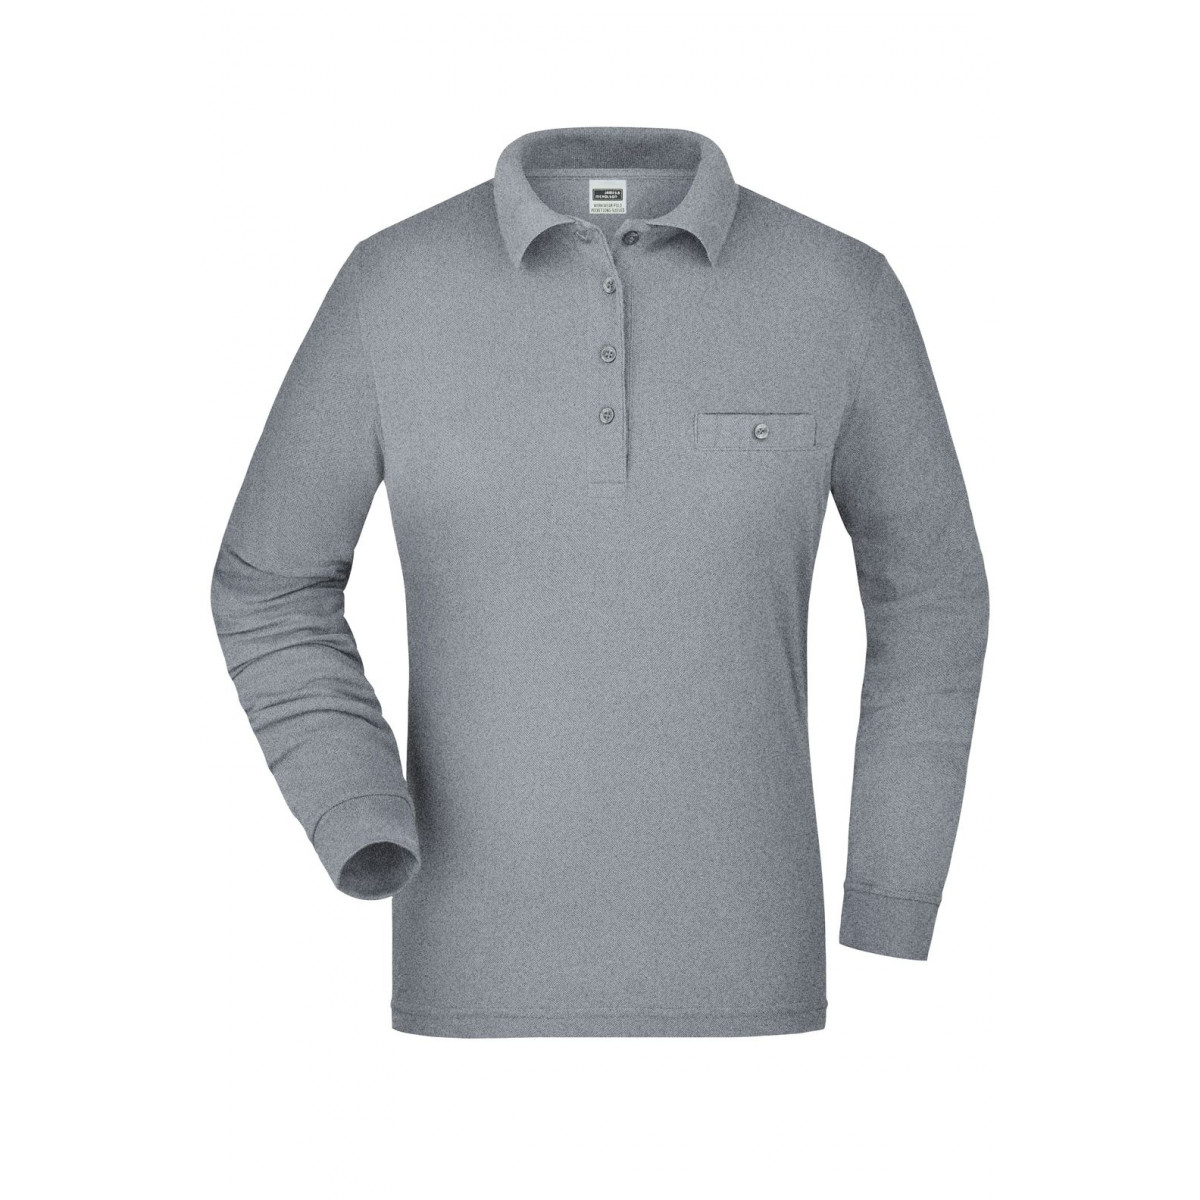 Рубашка поло женская JN865 Ladies Workwear Polo Pocket Longsleeve - Серый меланж